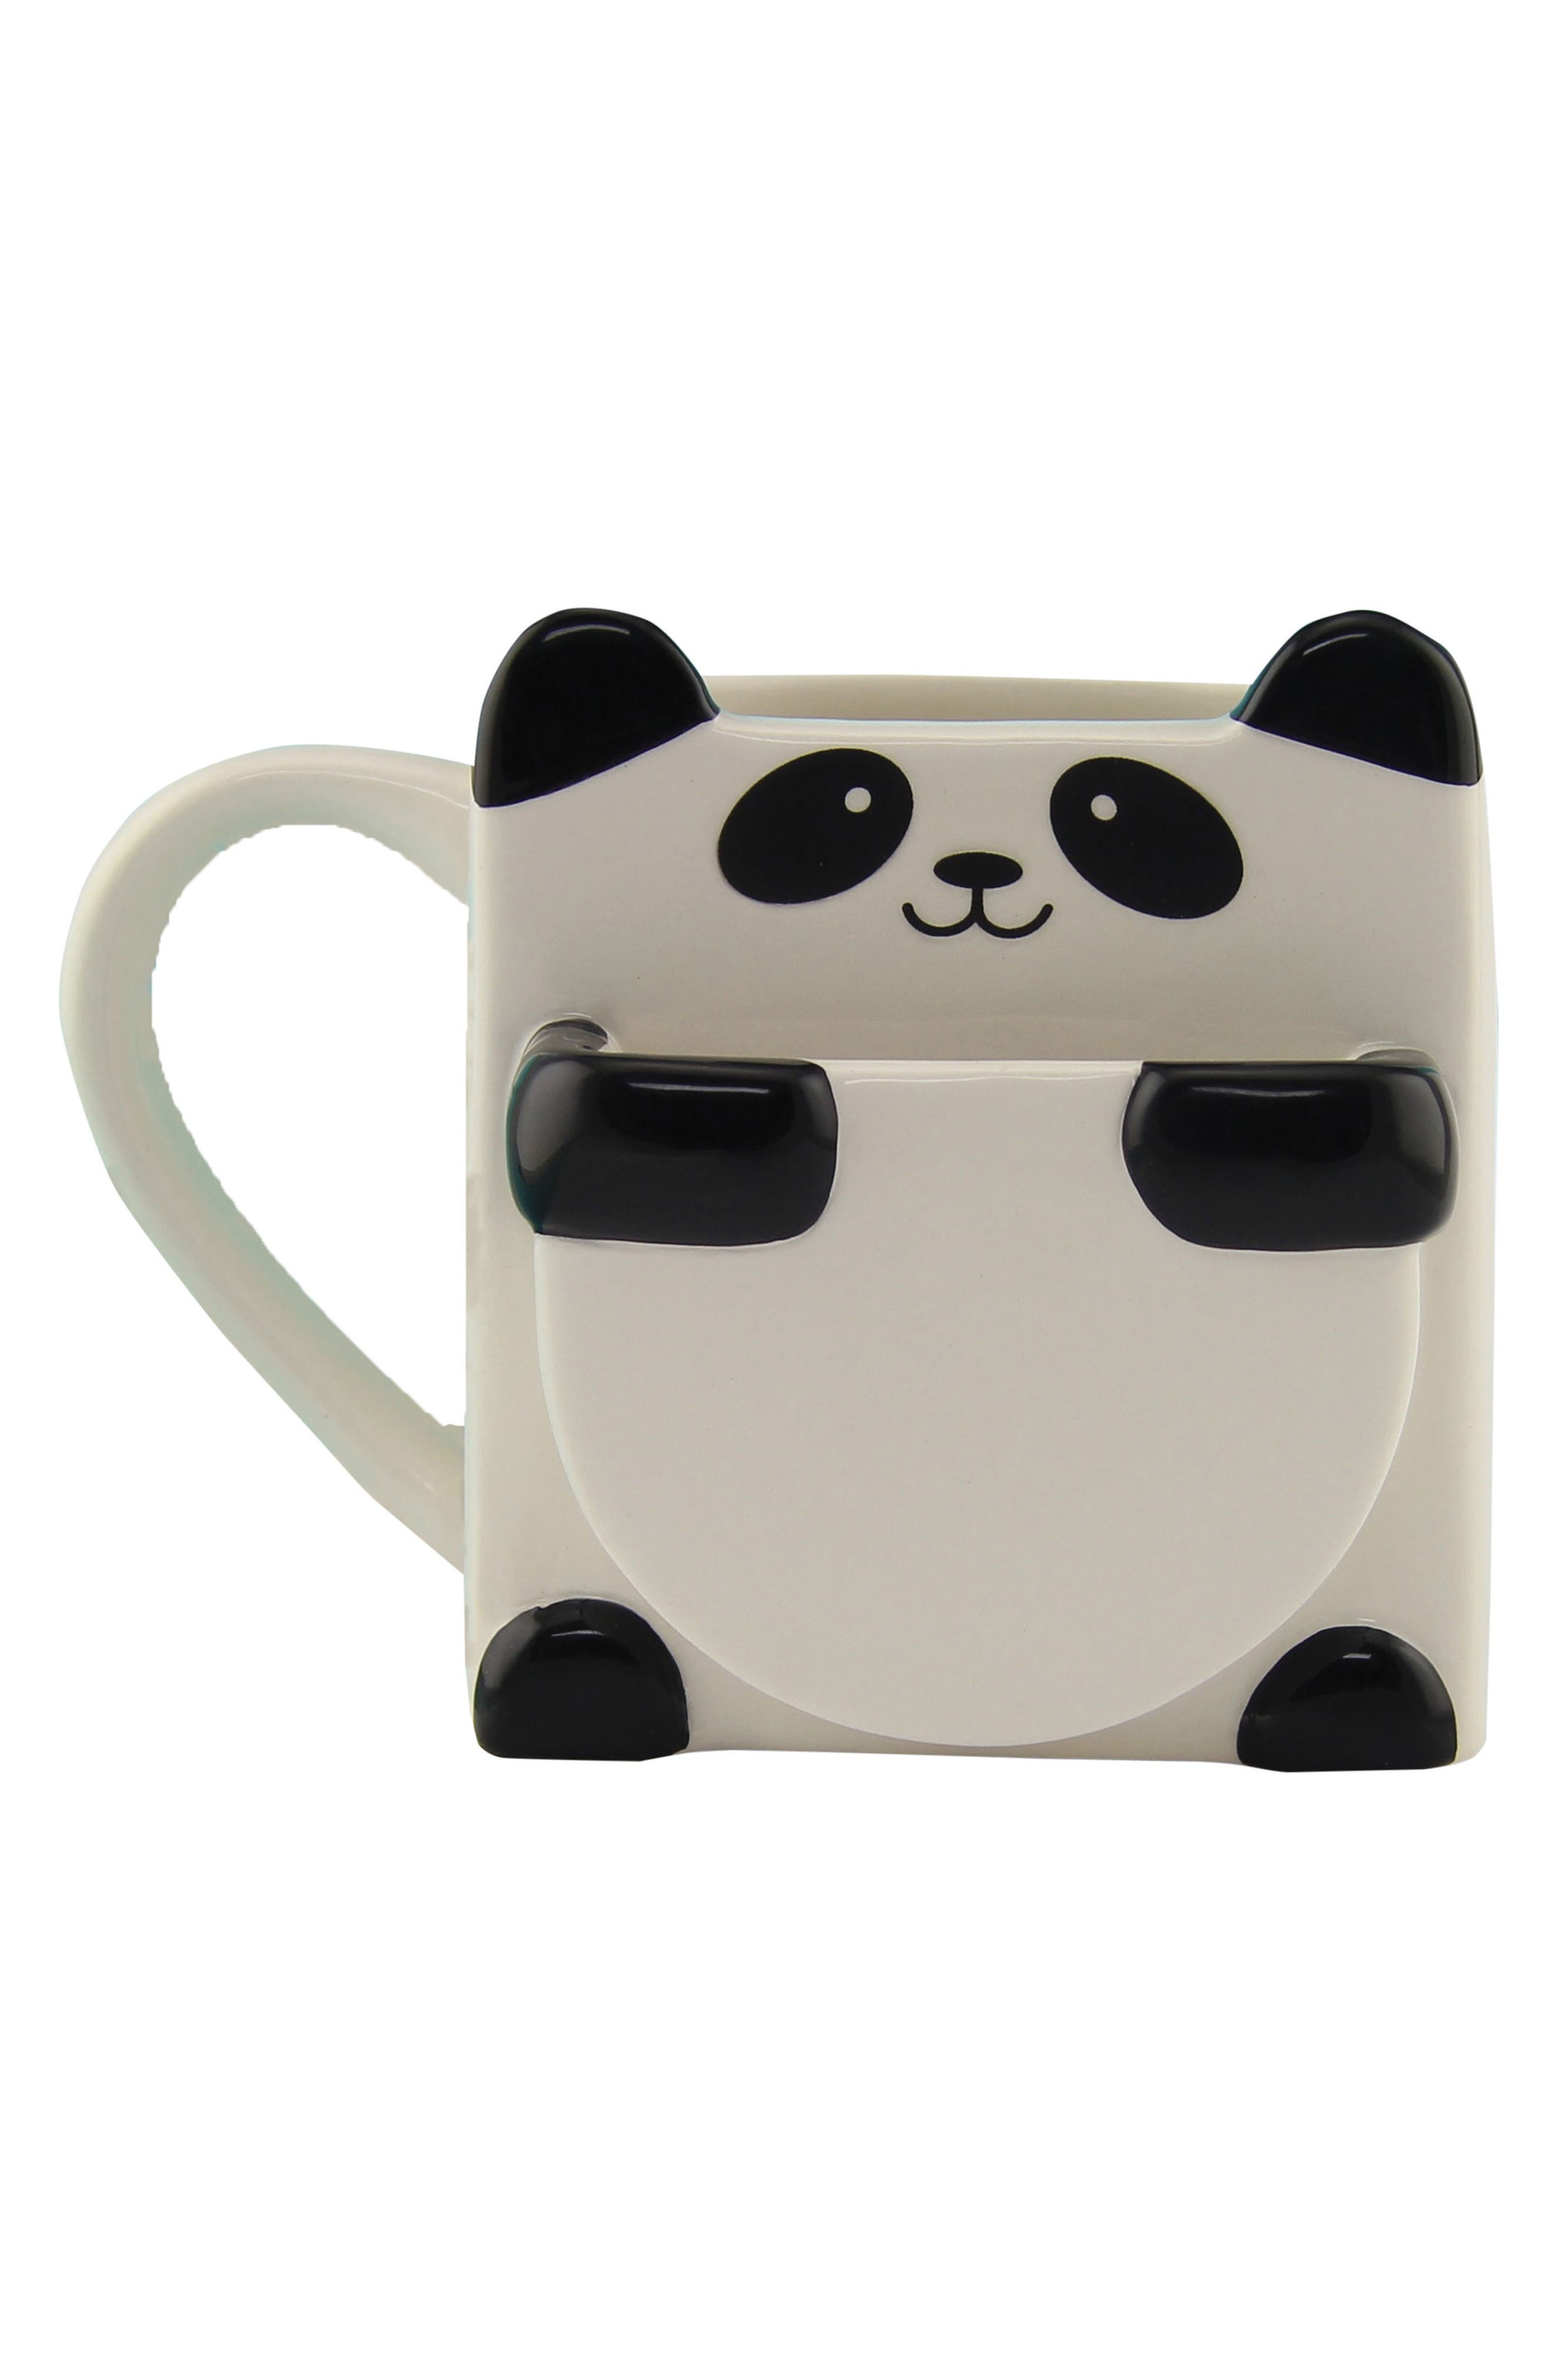 Main Image - Paladone Panda Hug Mug with Cookie Pocket